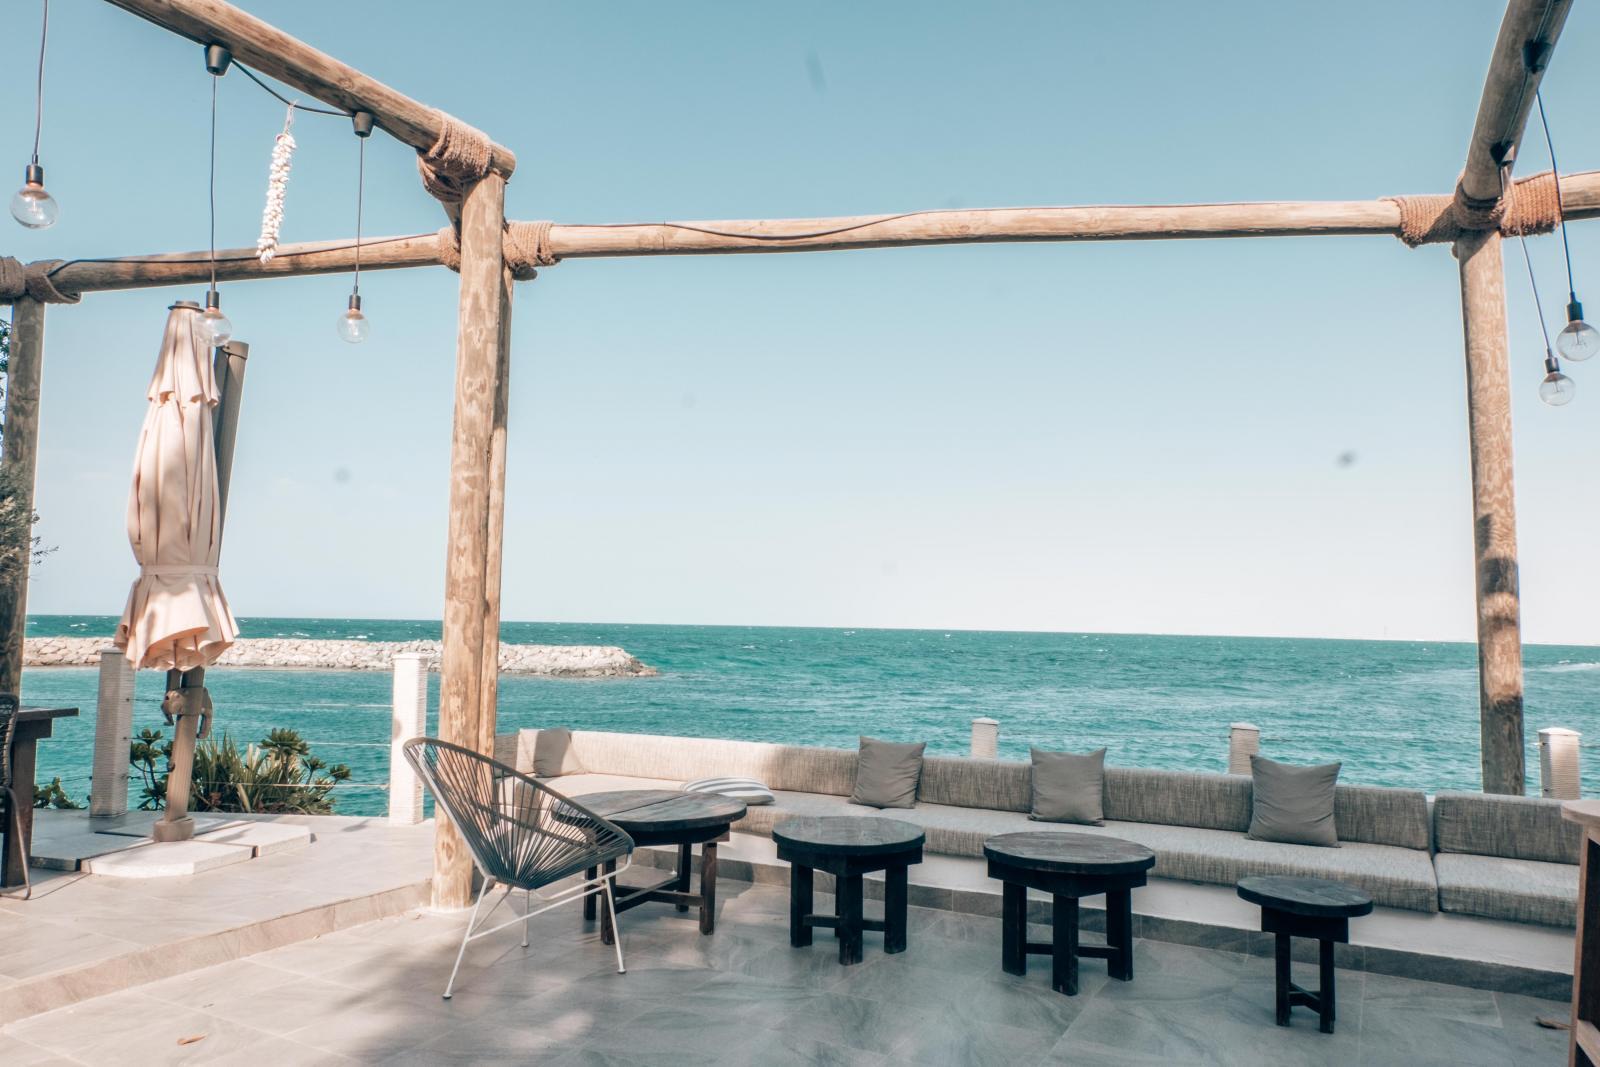 Zaya Nurai Island Hooked Restaurant